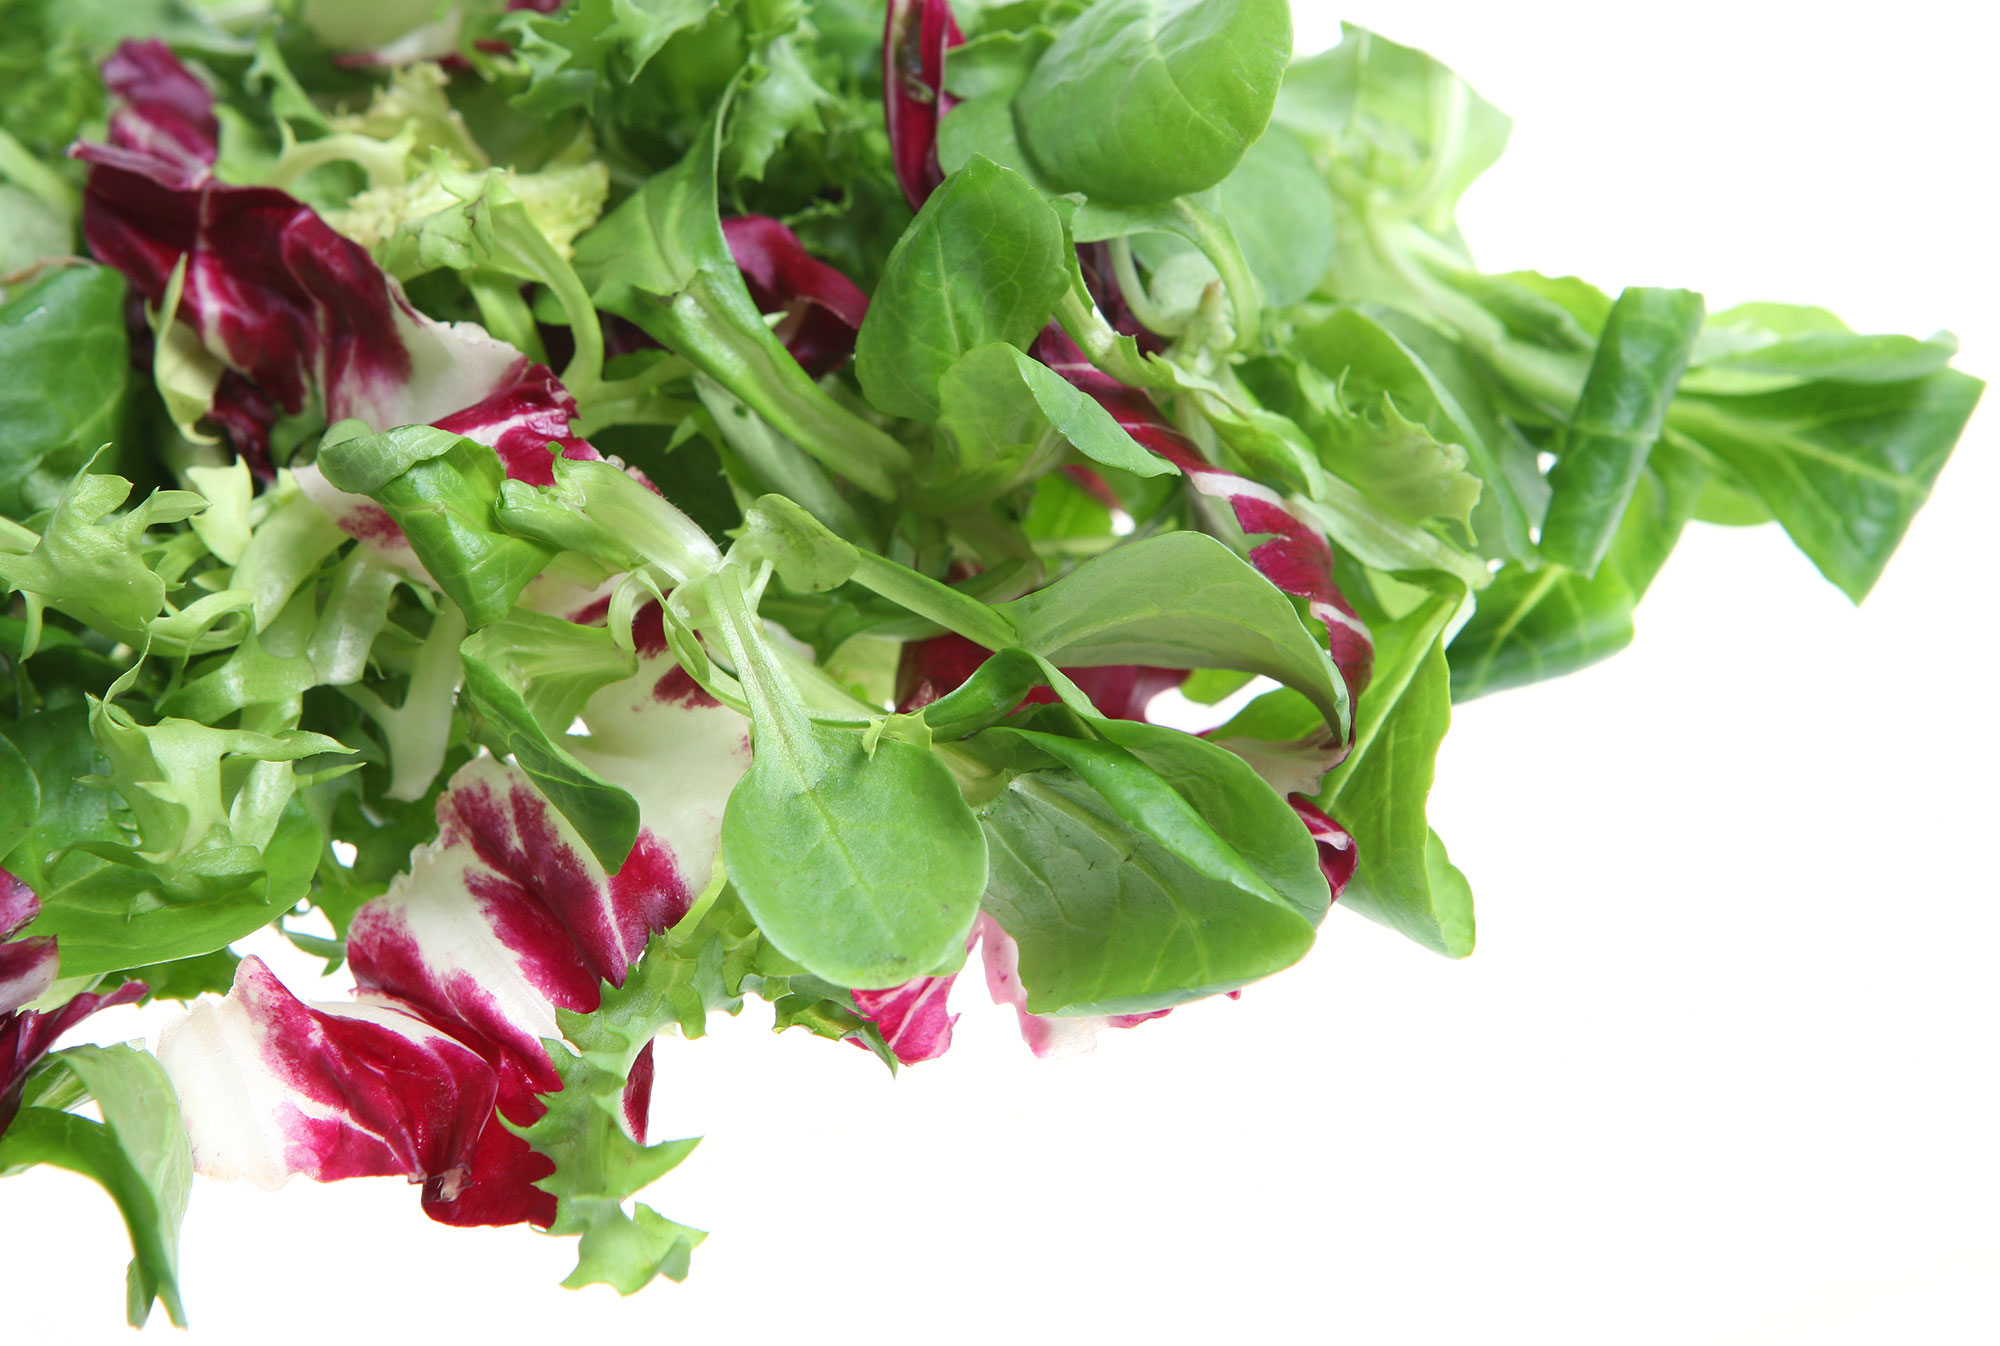 Mixed-Leaf-Salad